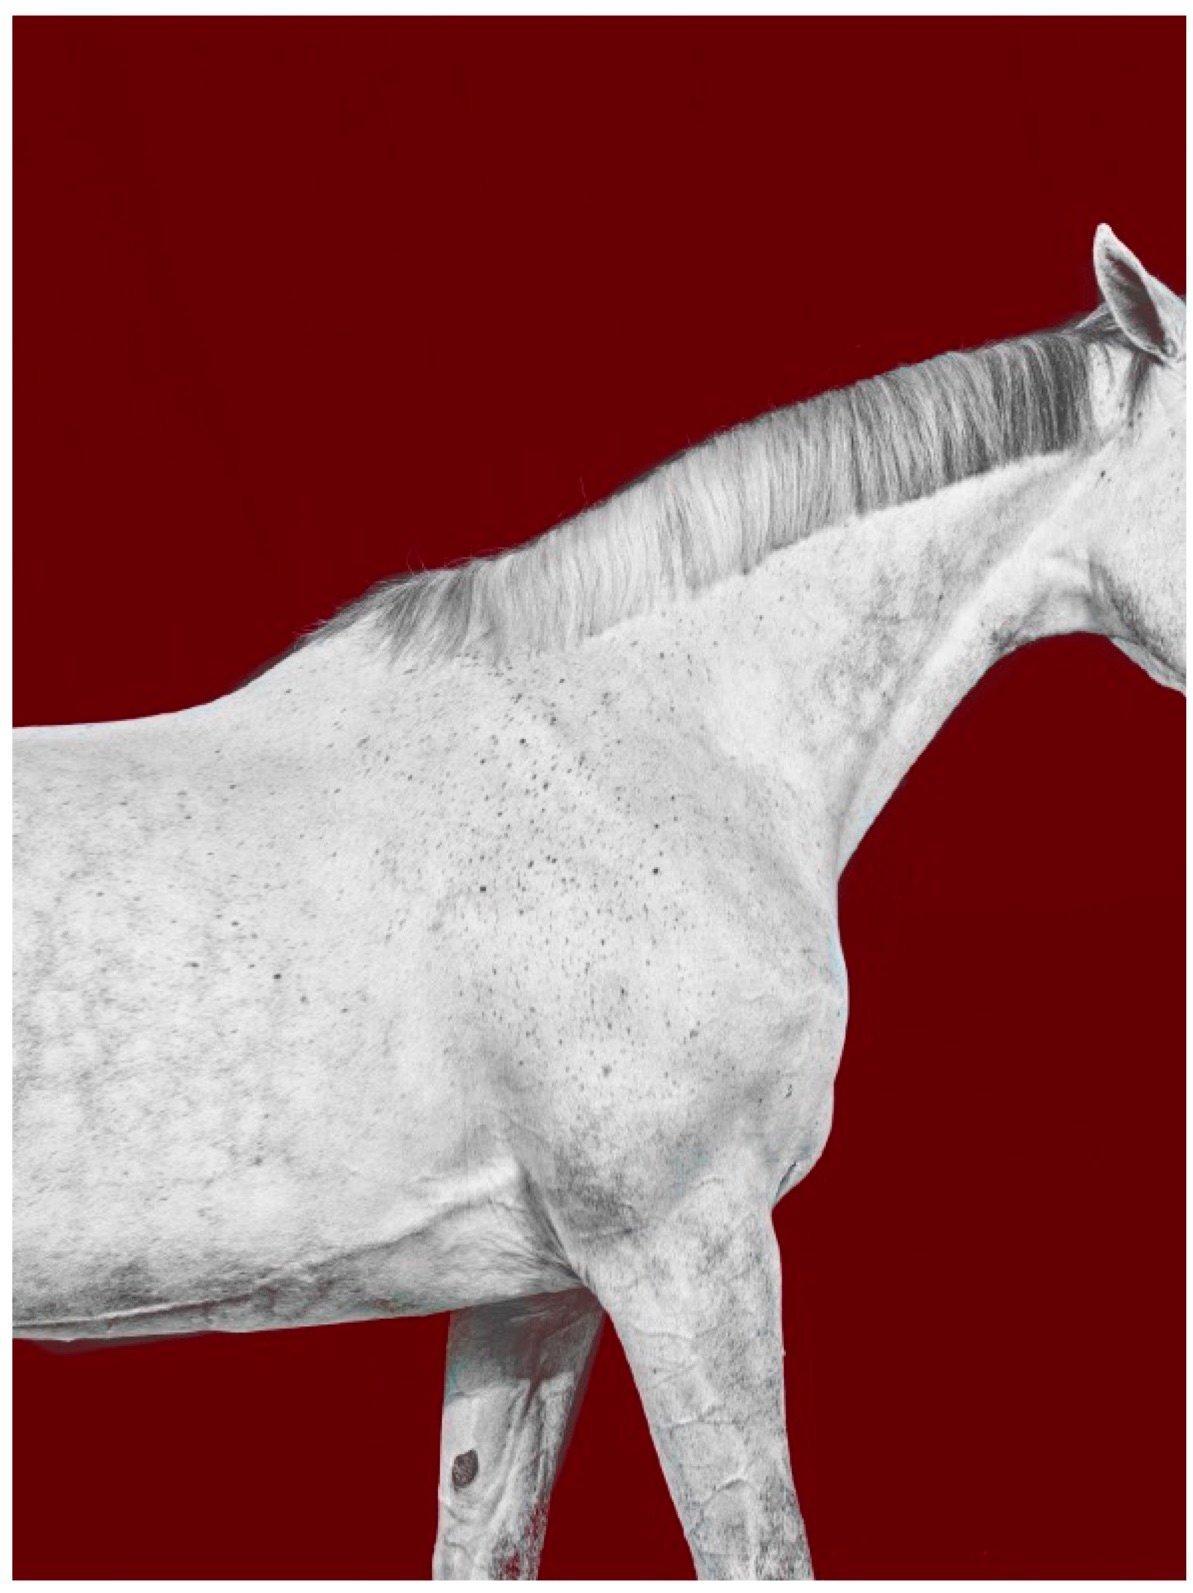 Tixie on Red I, Horse Series, Medium Archival Pigment Print, Framed